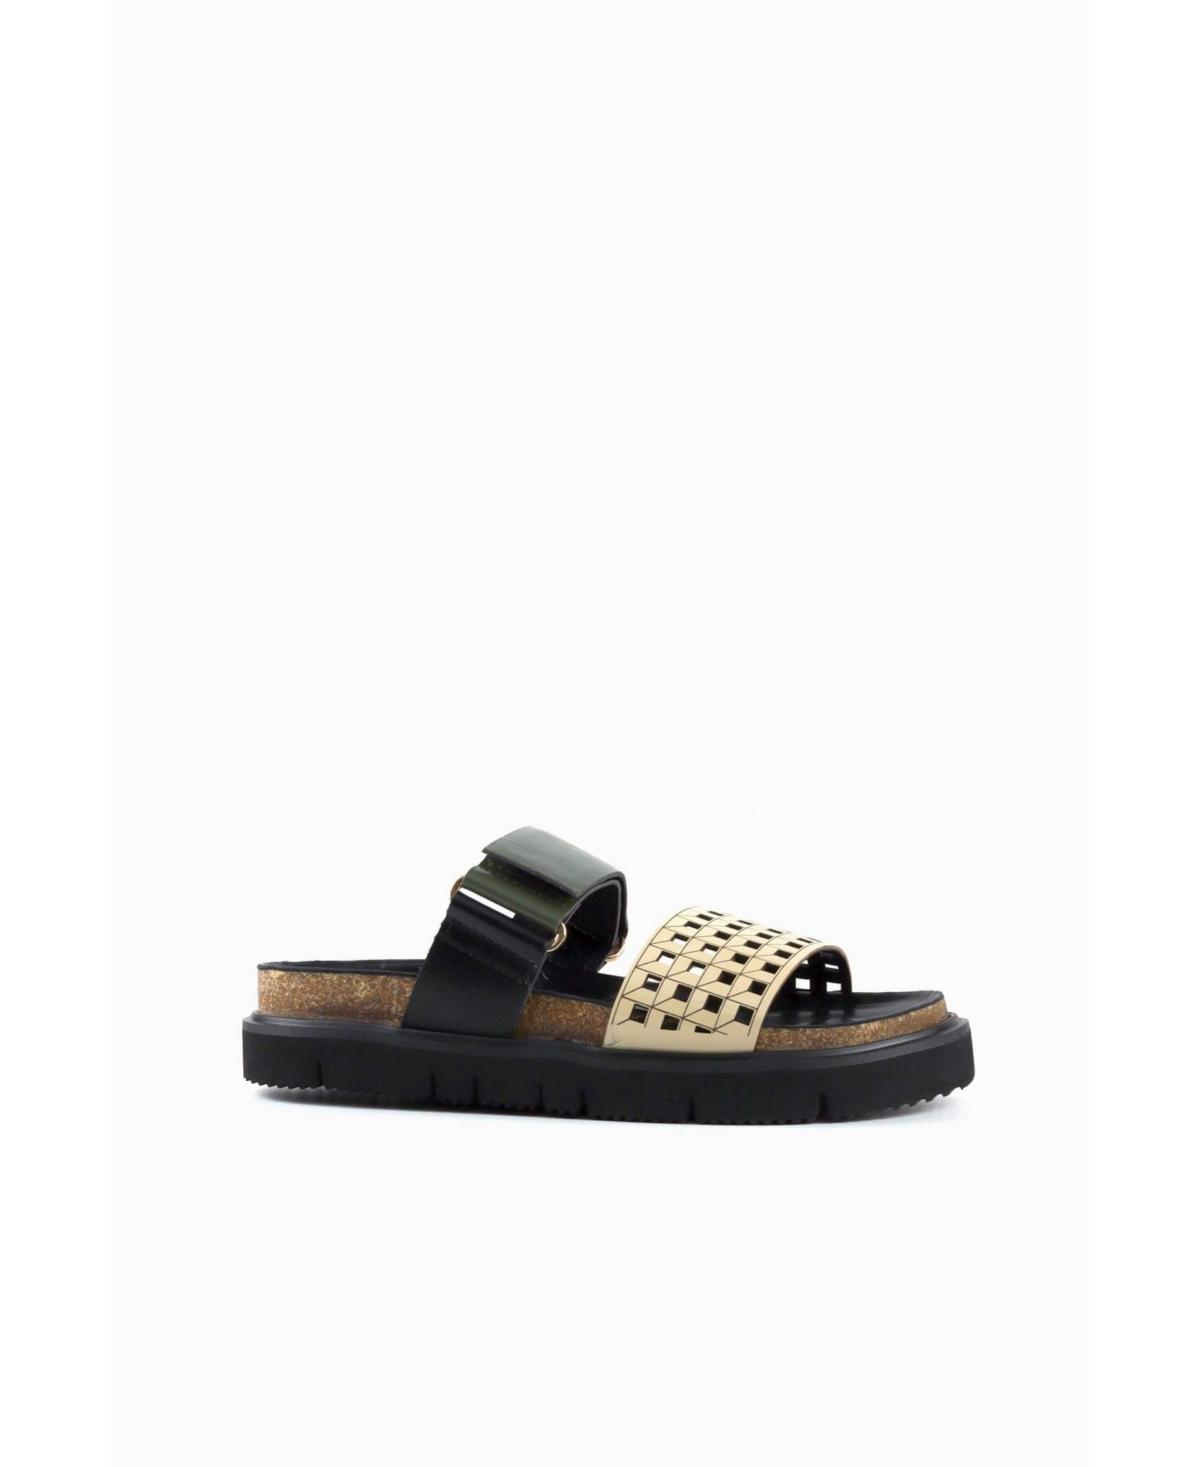 Women's Square Perf Lowform Sporty Slip-On Sandals Women's Shoes